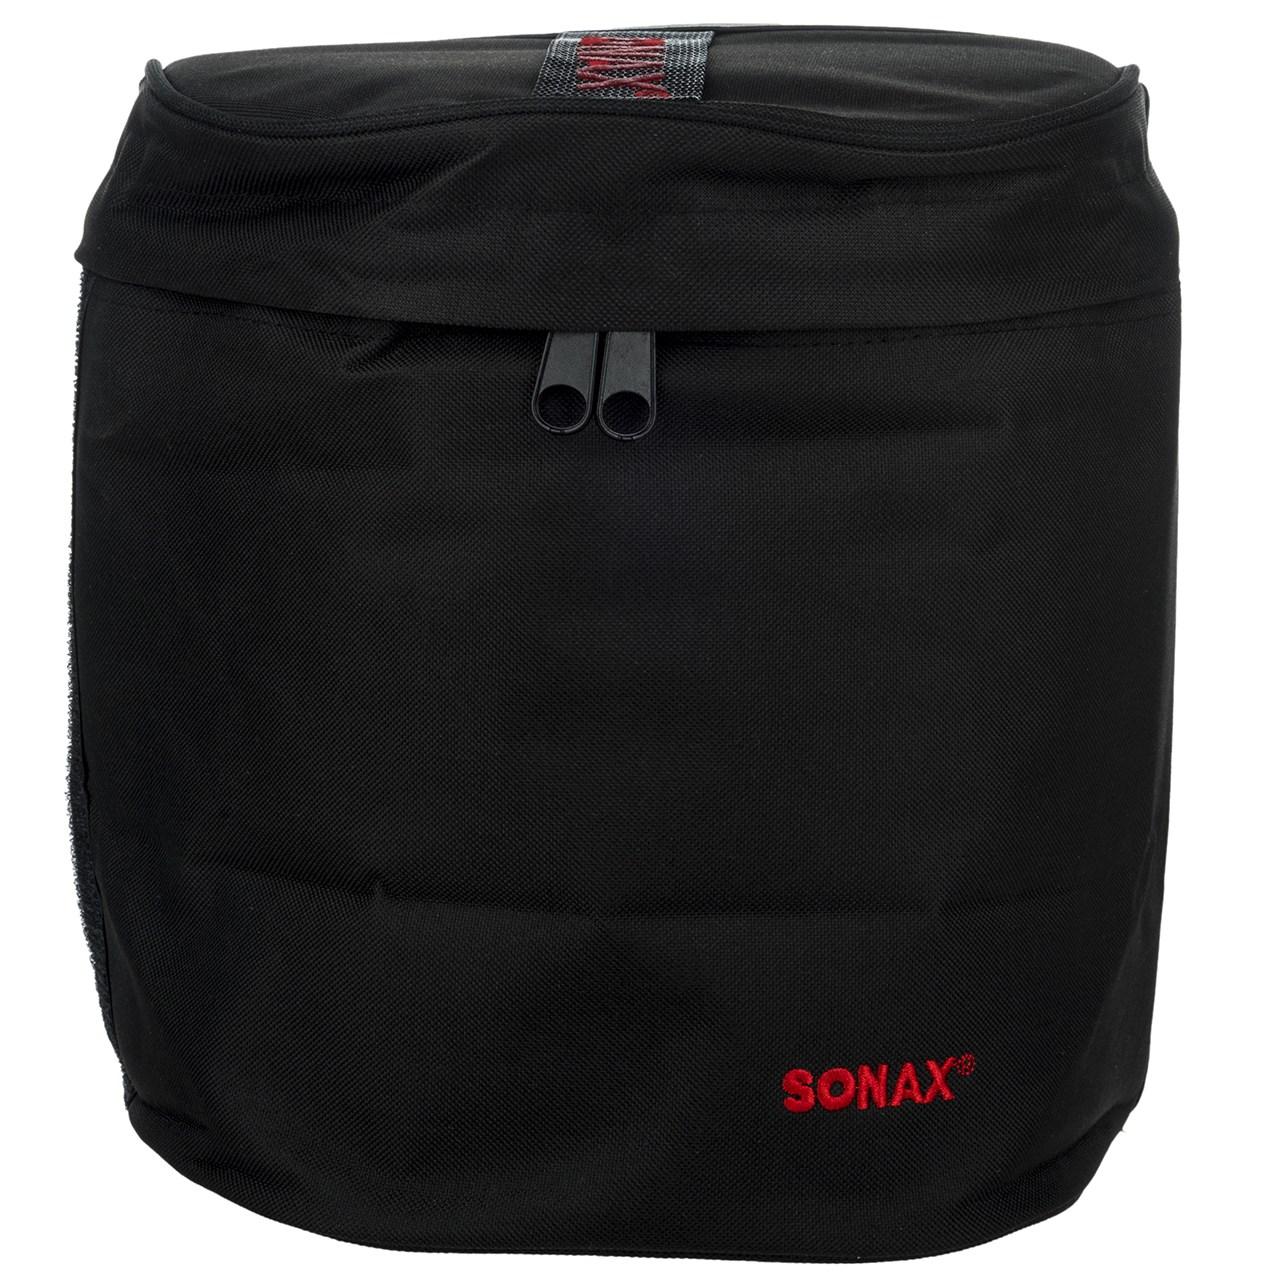 کیف نظم دهنده صندوق عقب خودرو سوناکس مدل 01847985 | Sonax 01847985 Trunk Organizer